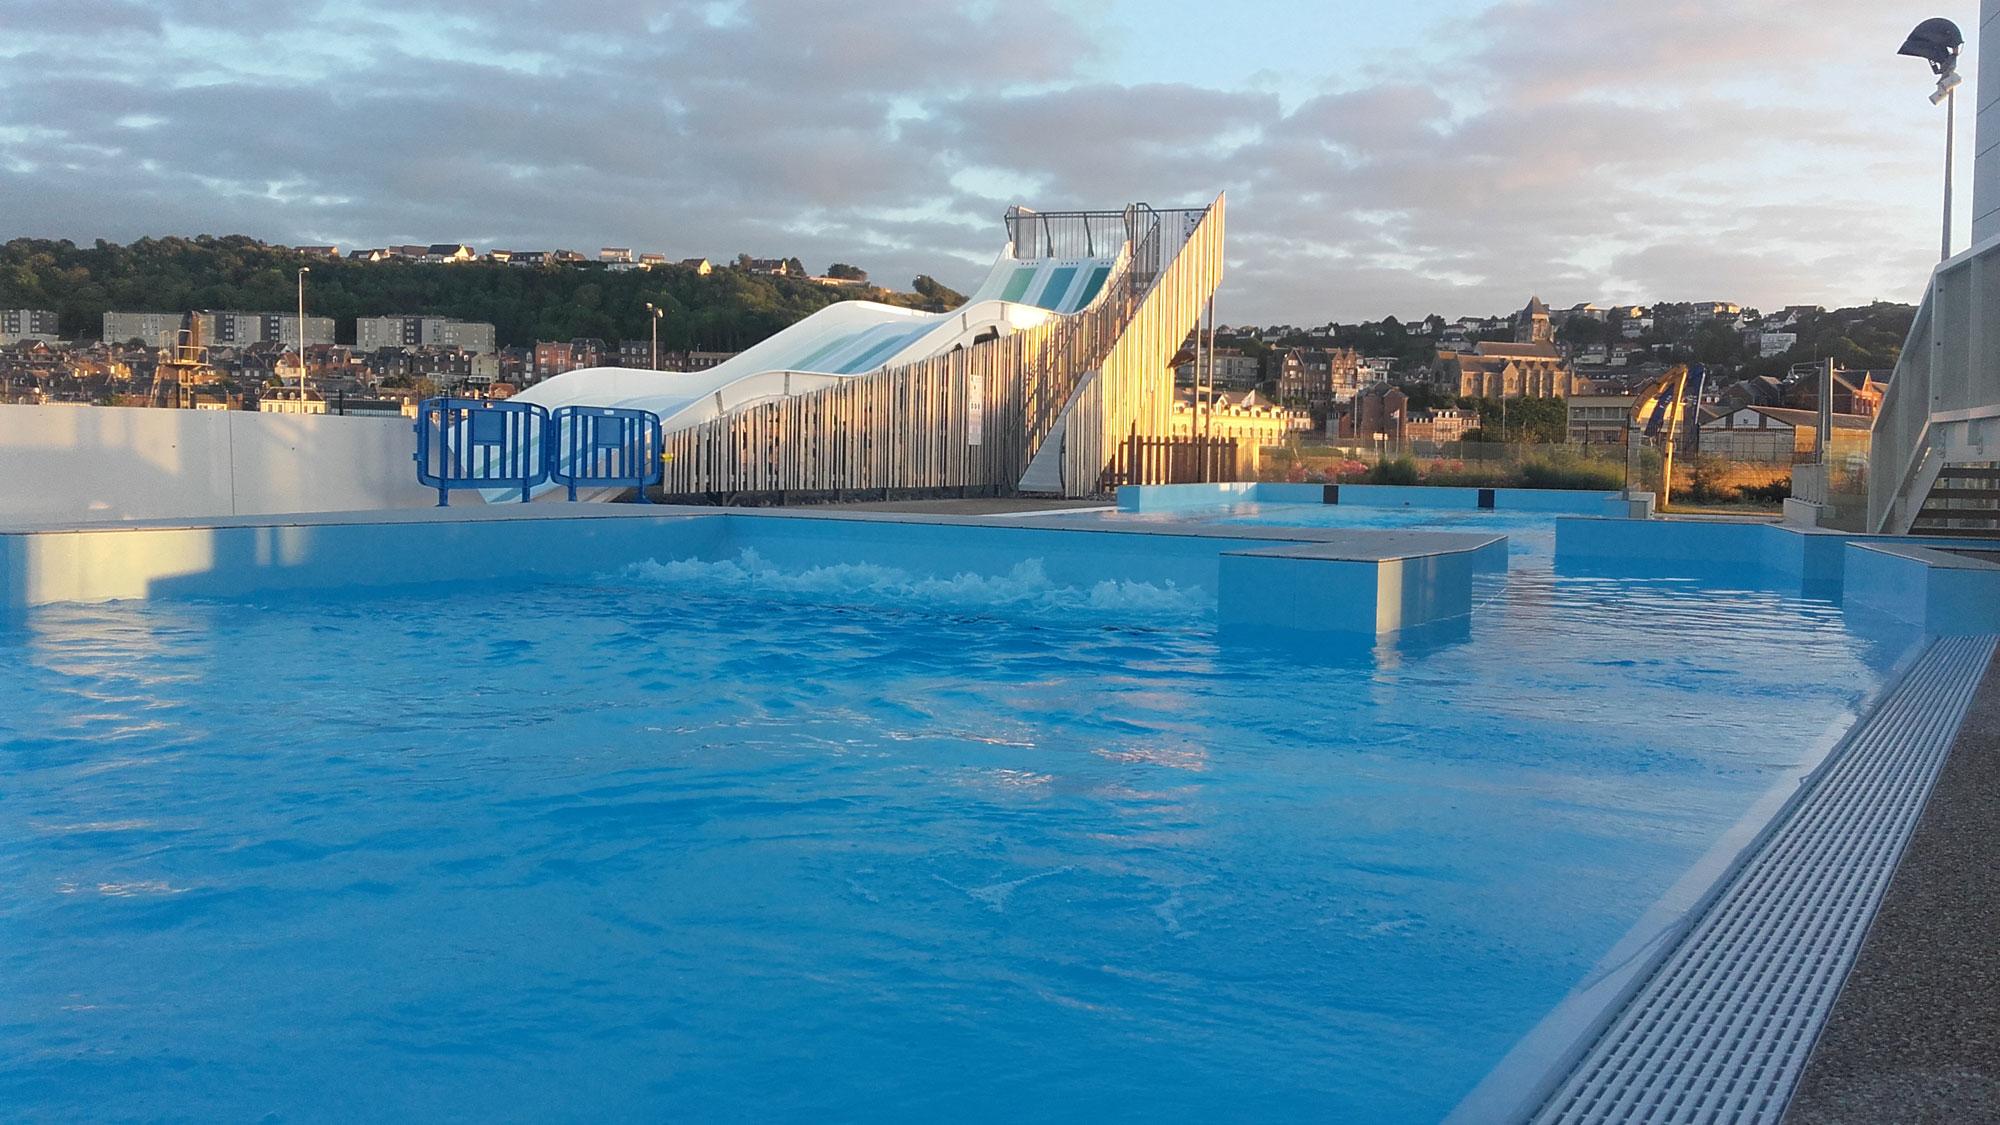 Centre Aquatique Intercommunal (O2 Falaises) – Mers-Les-Bains serapportantà Piscine Falaise